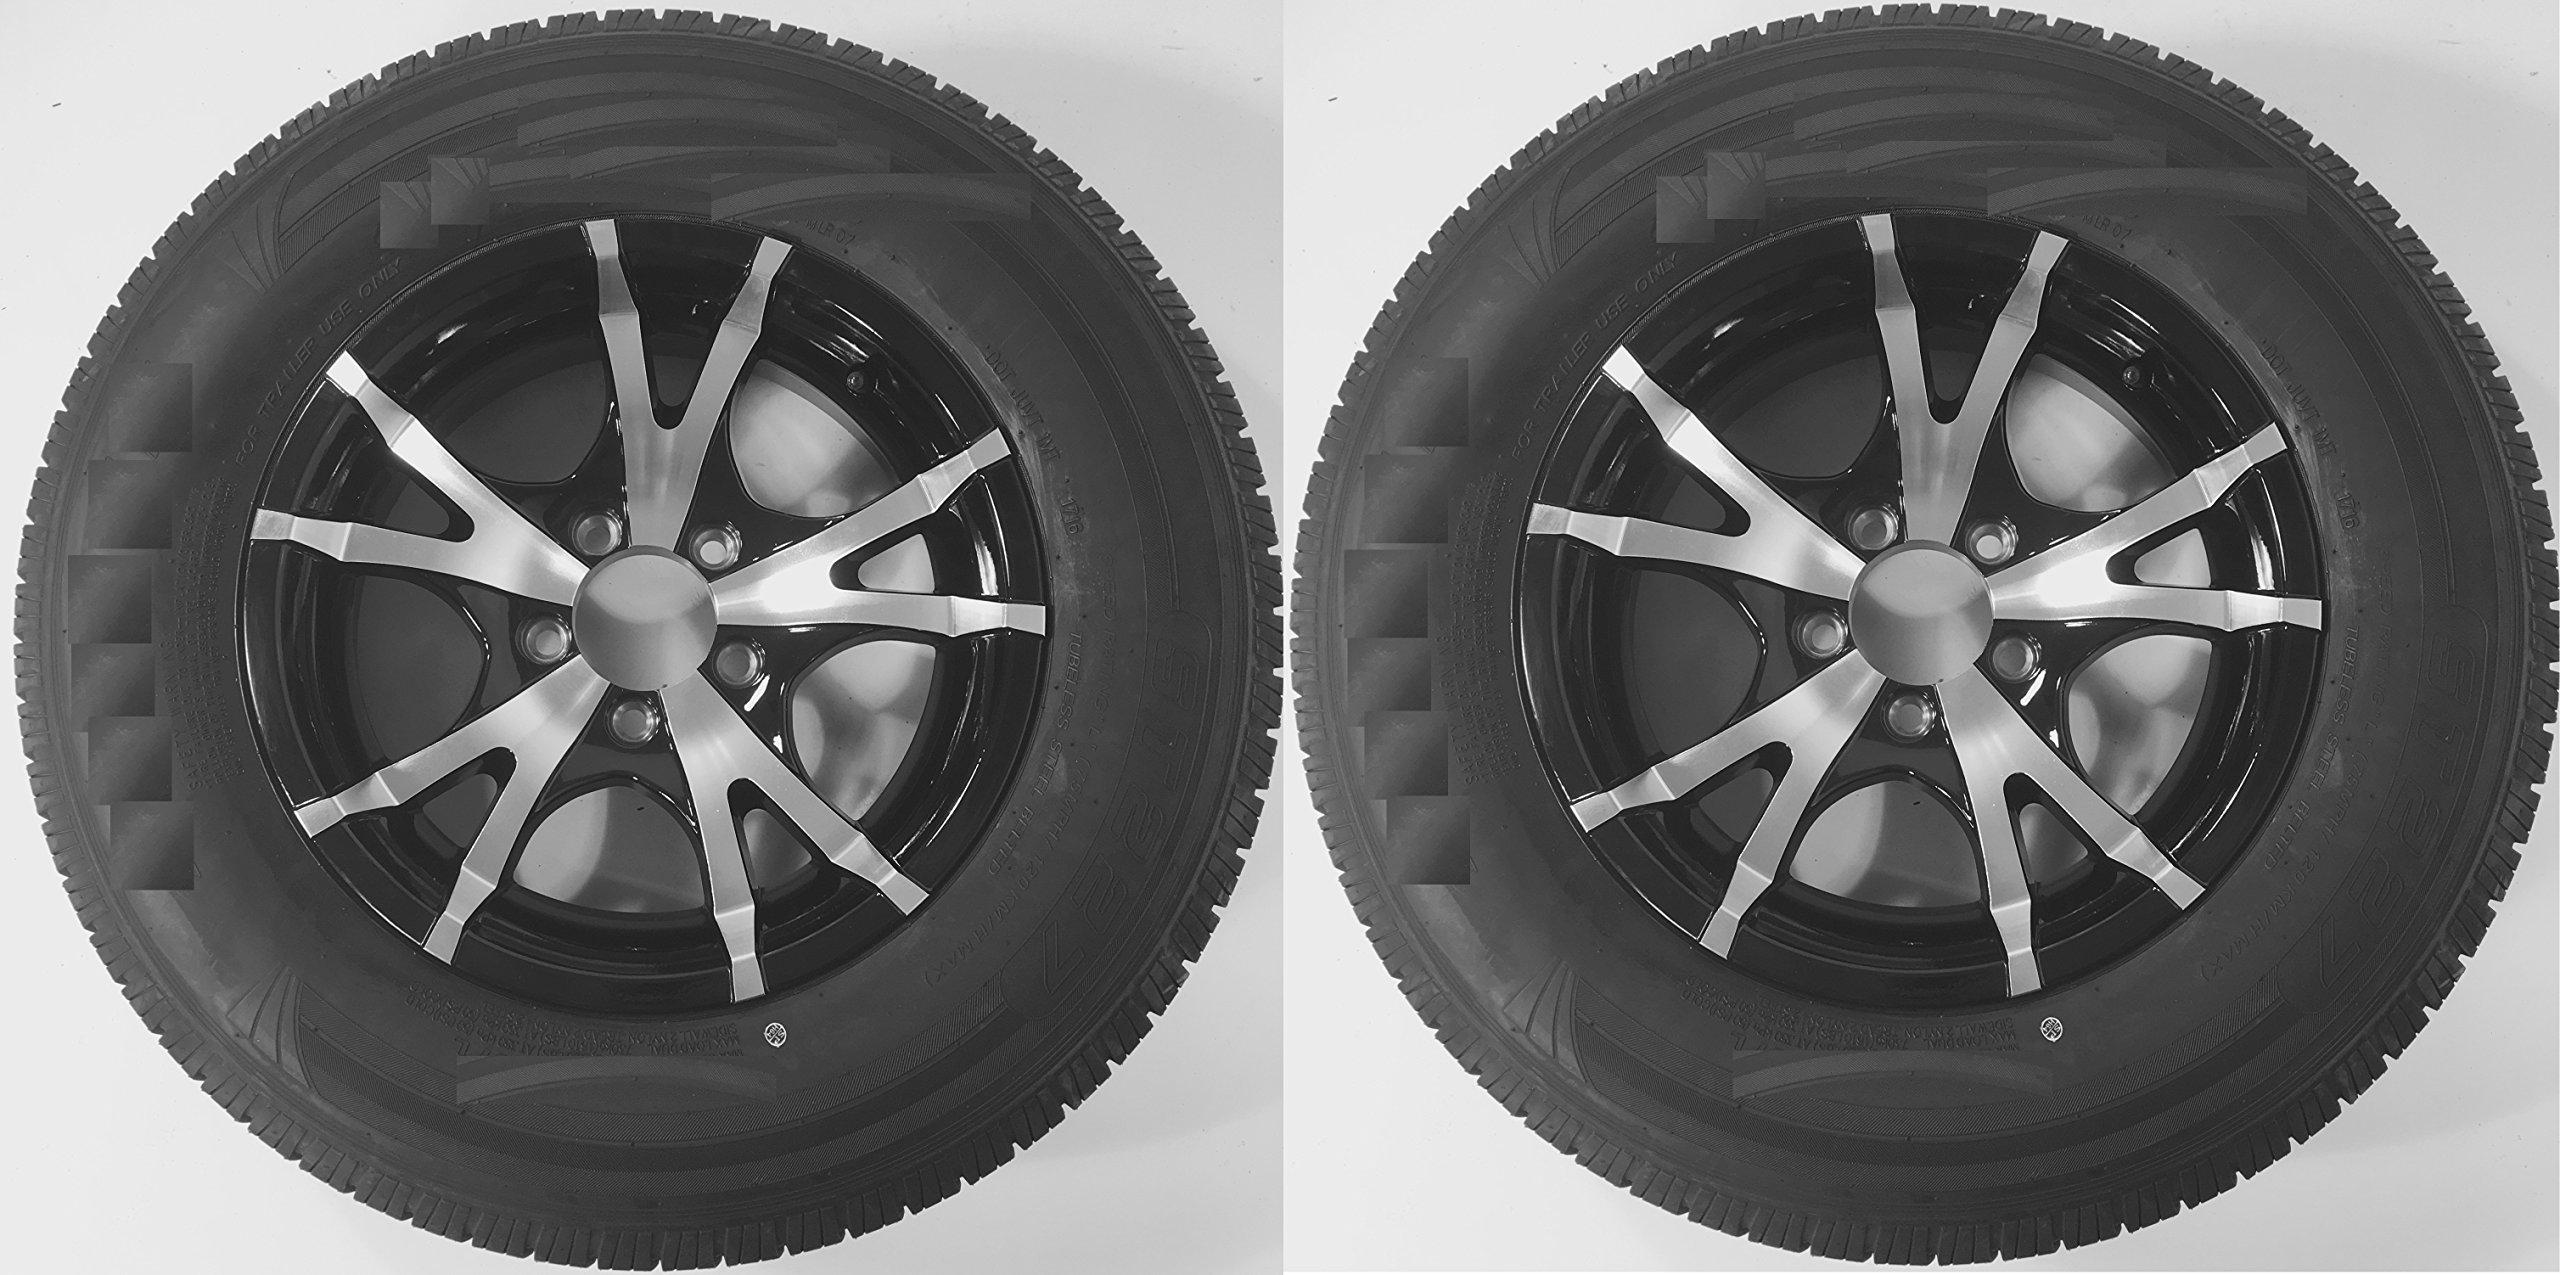 2-Pack Trailer Tires ST175/80D13 Load C 5 Lug Black T07 Aluminum Rim Wheel